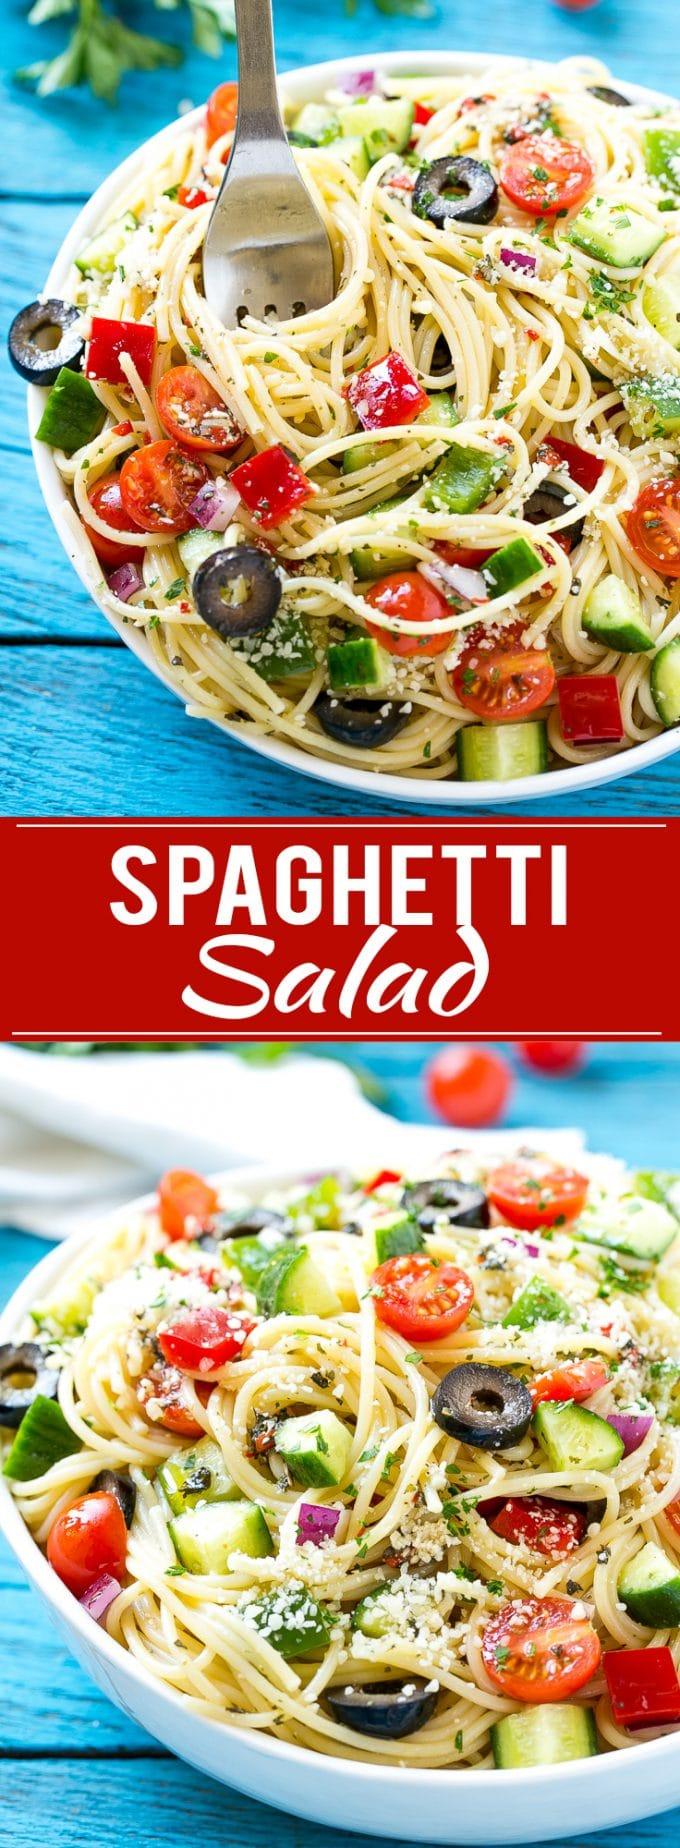 Receta de ensalada de espagueti |  Ensalada de pasta |  Receta Potluck |  Ensalada de pasta fácil # espaguetis #pasta #insalata #dinneratthezoo